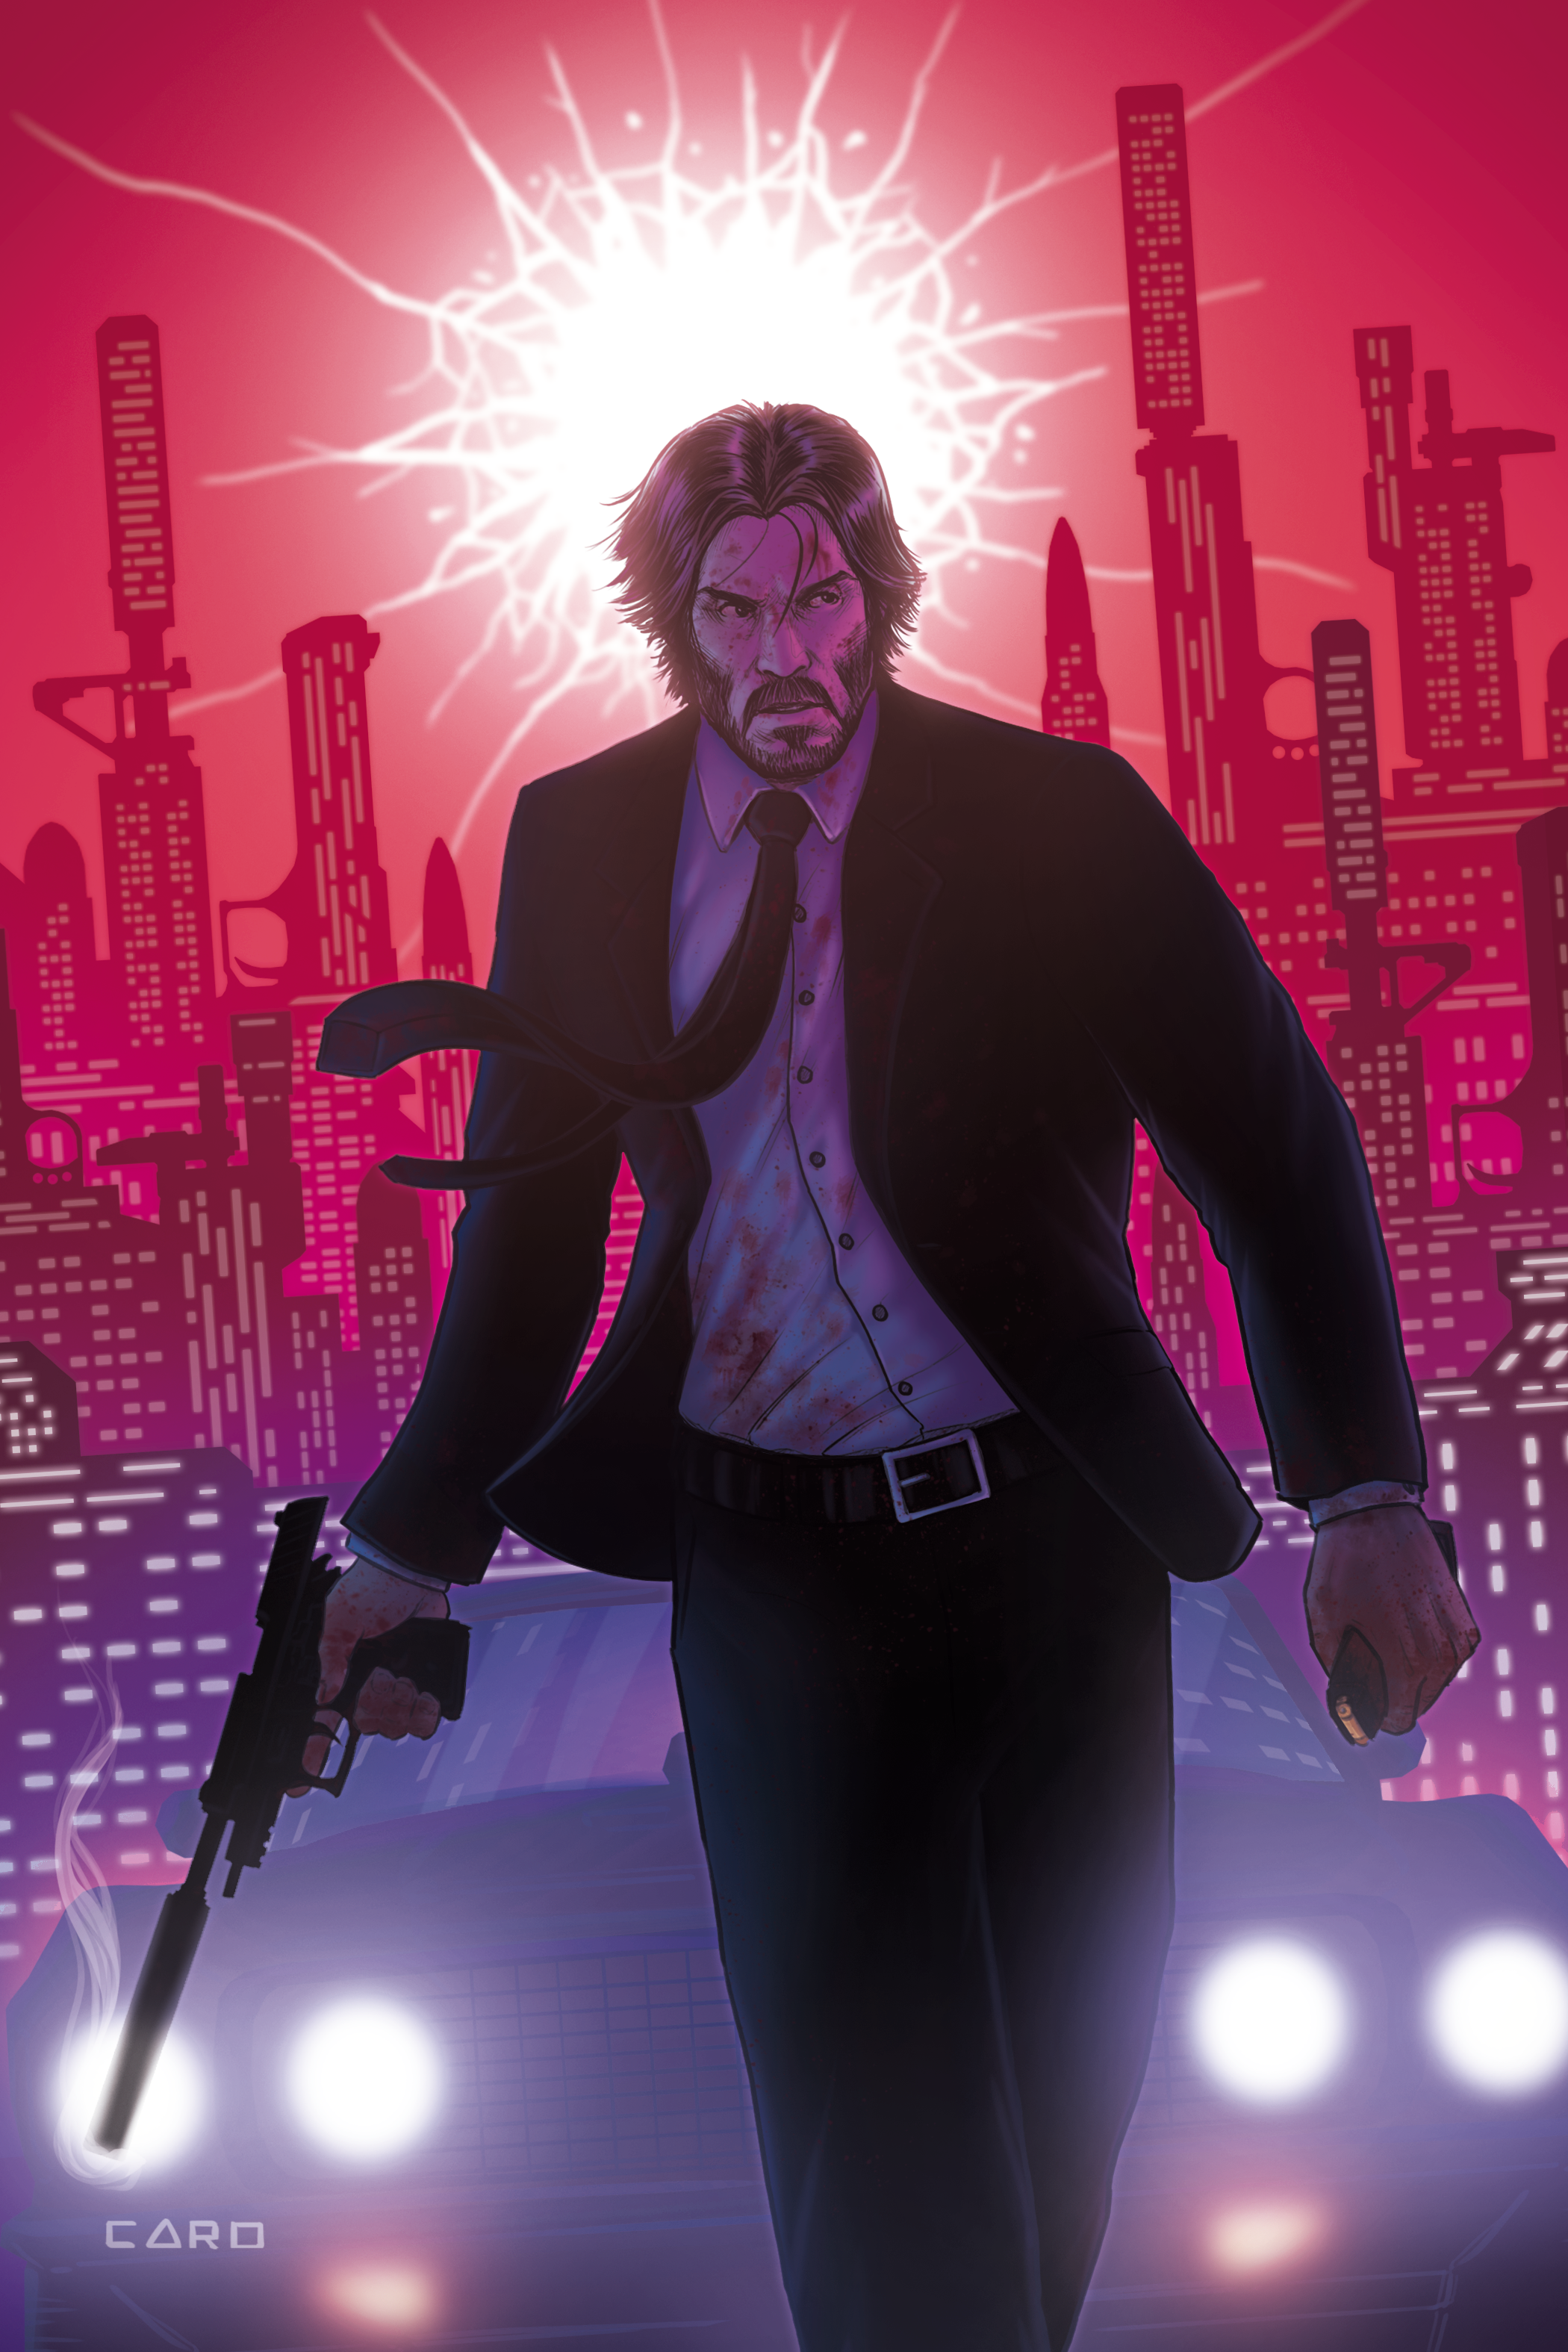 John Wick - Comic Cover